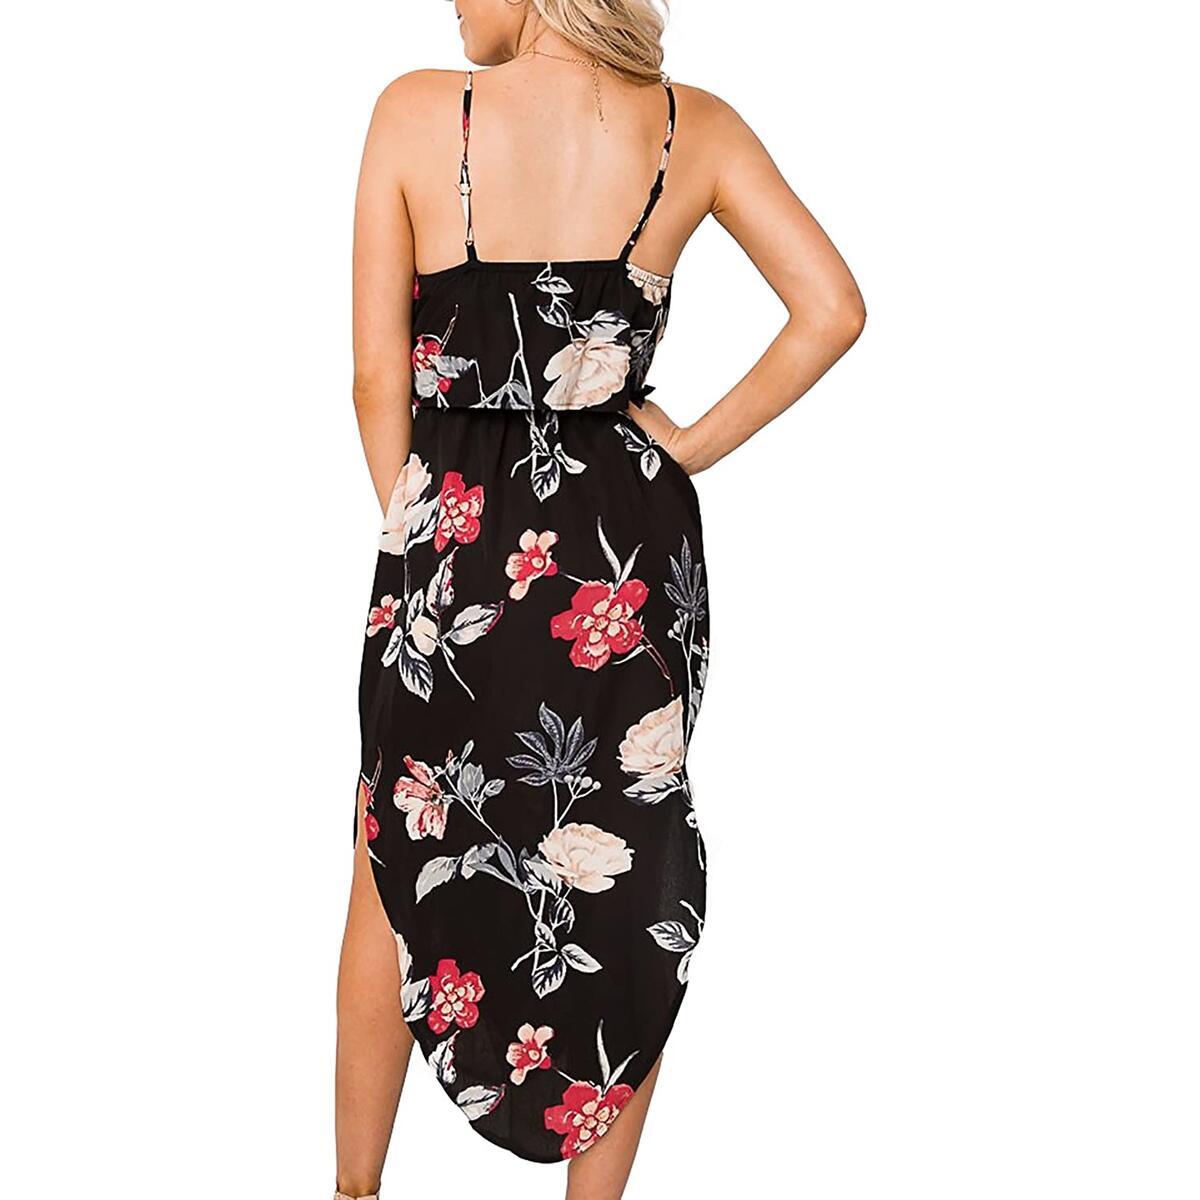 Alelly Women's Summer Boho Dress Spaghetti Strap Floral Printed Backless Split Beach Dress